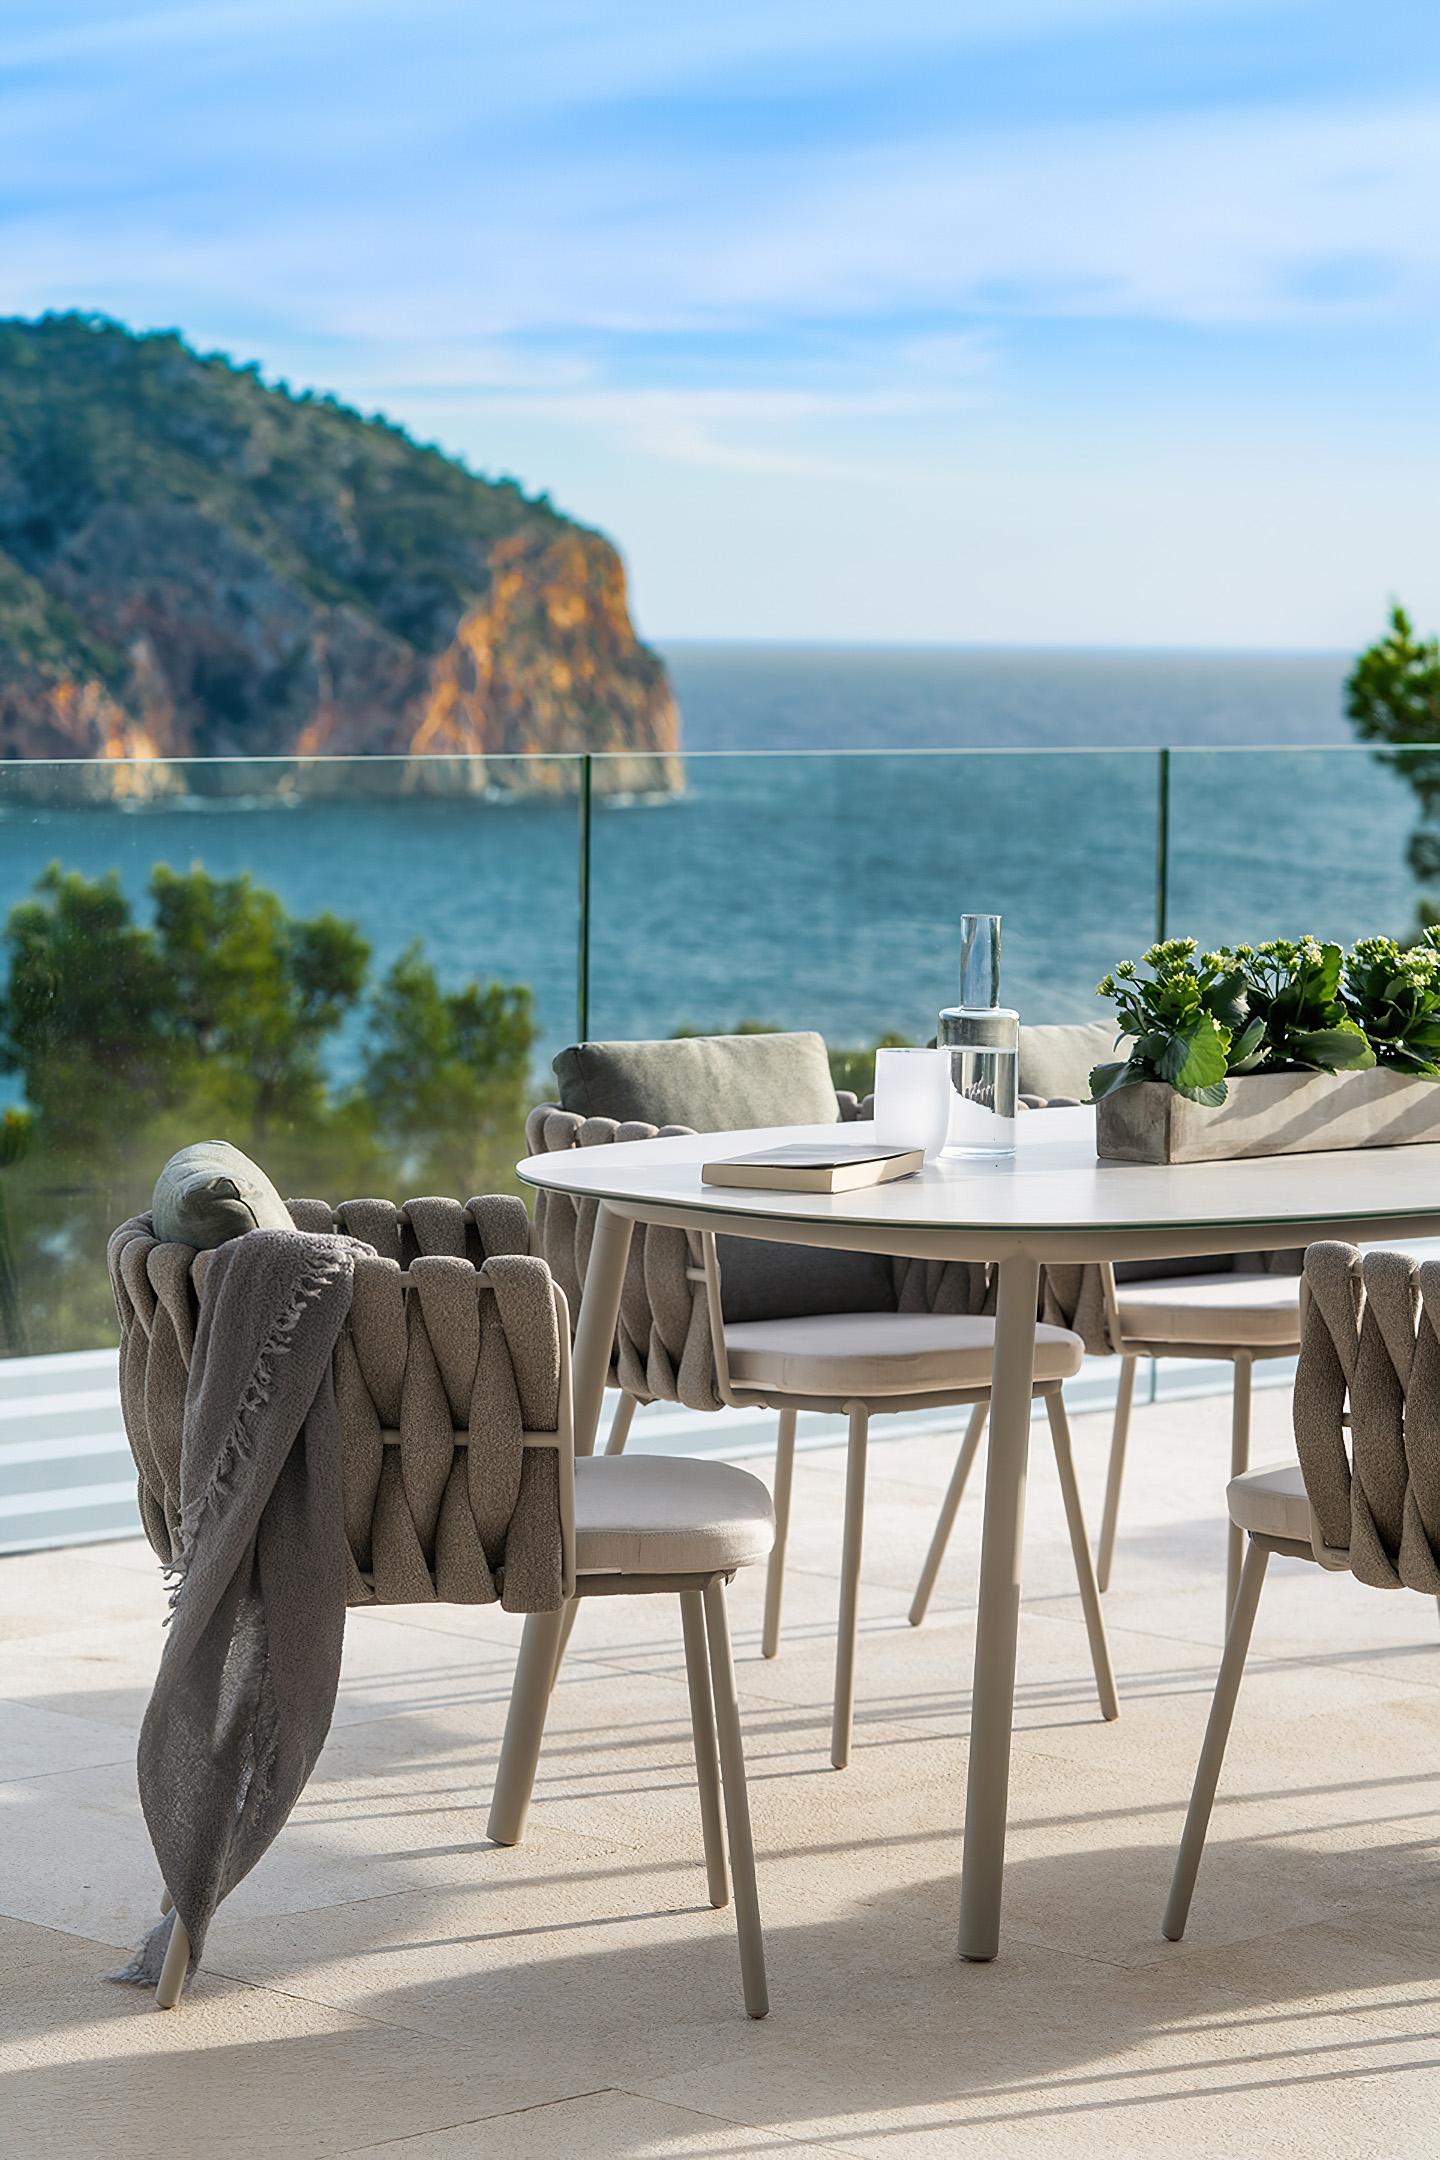 Villa Statera Interior Design Camp de Mar, Mallorca, Spain – Terraza Balear